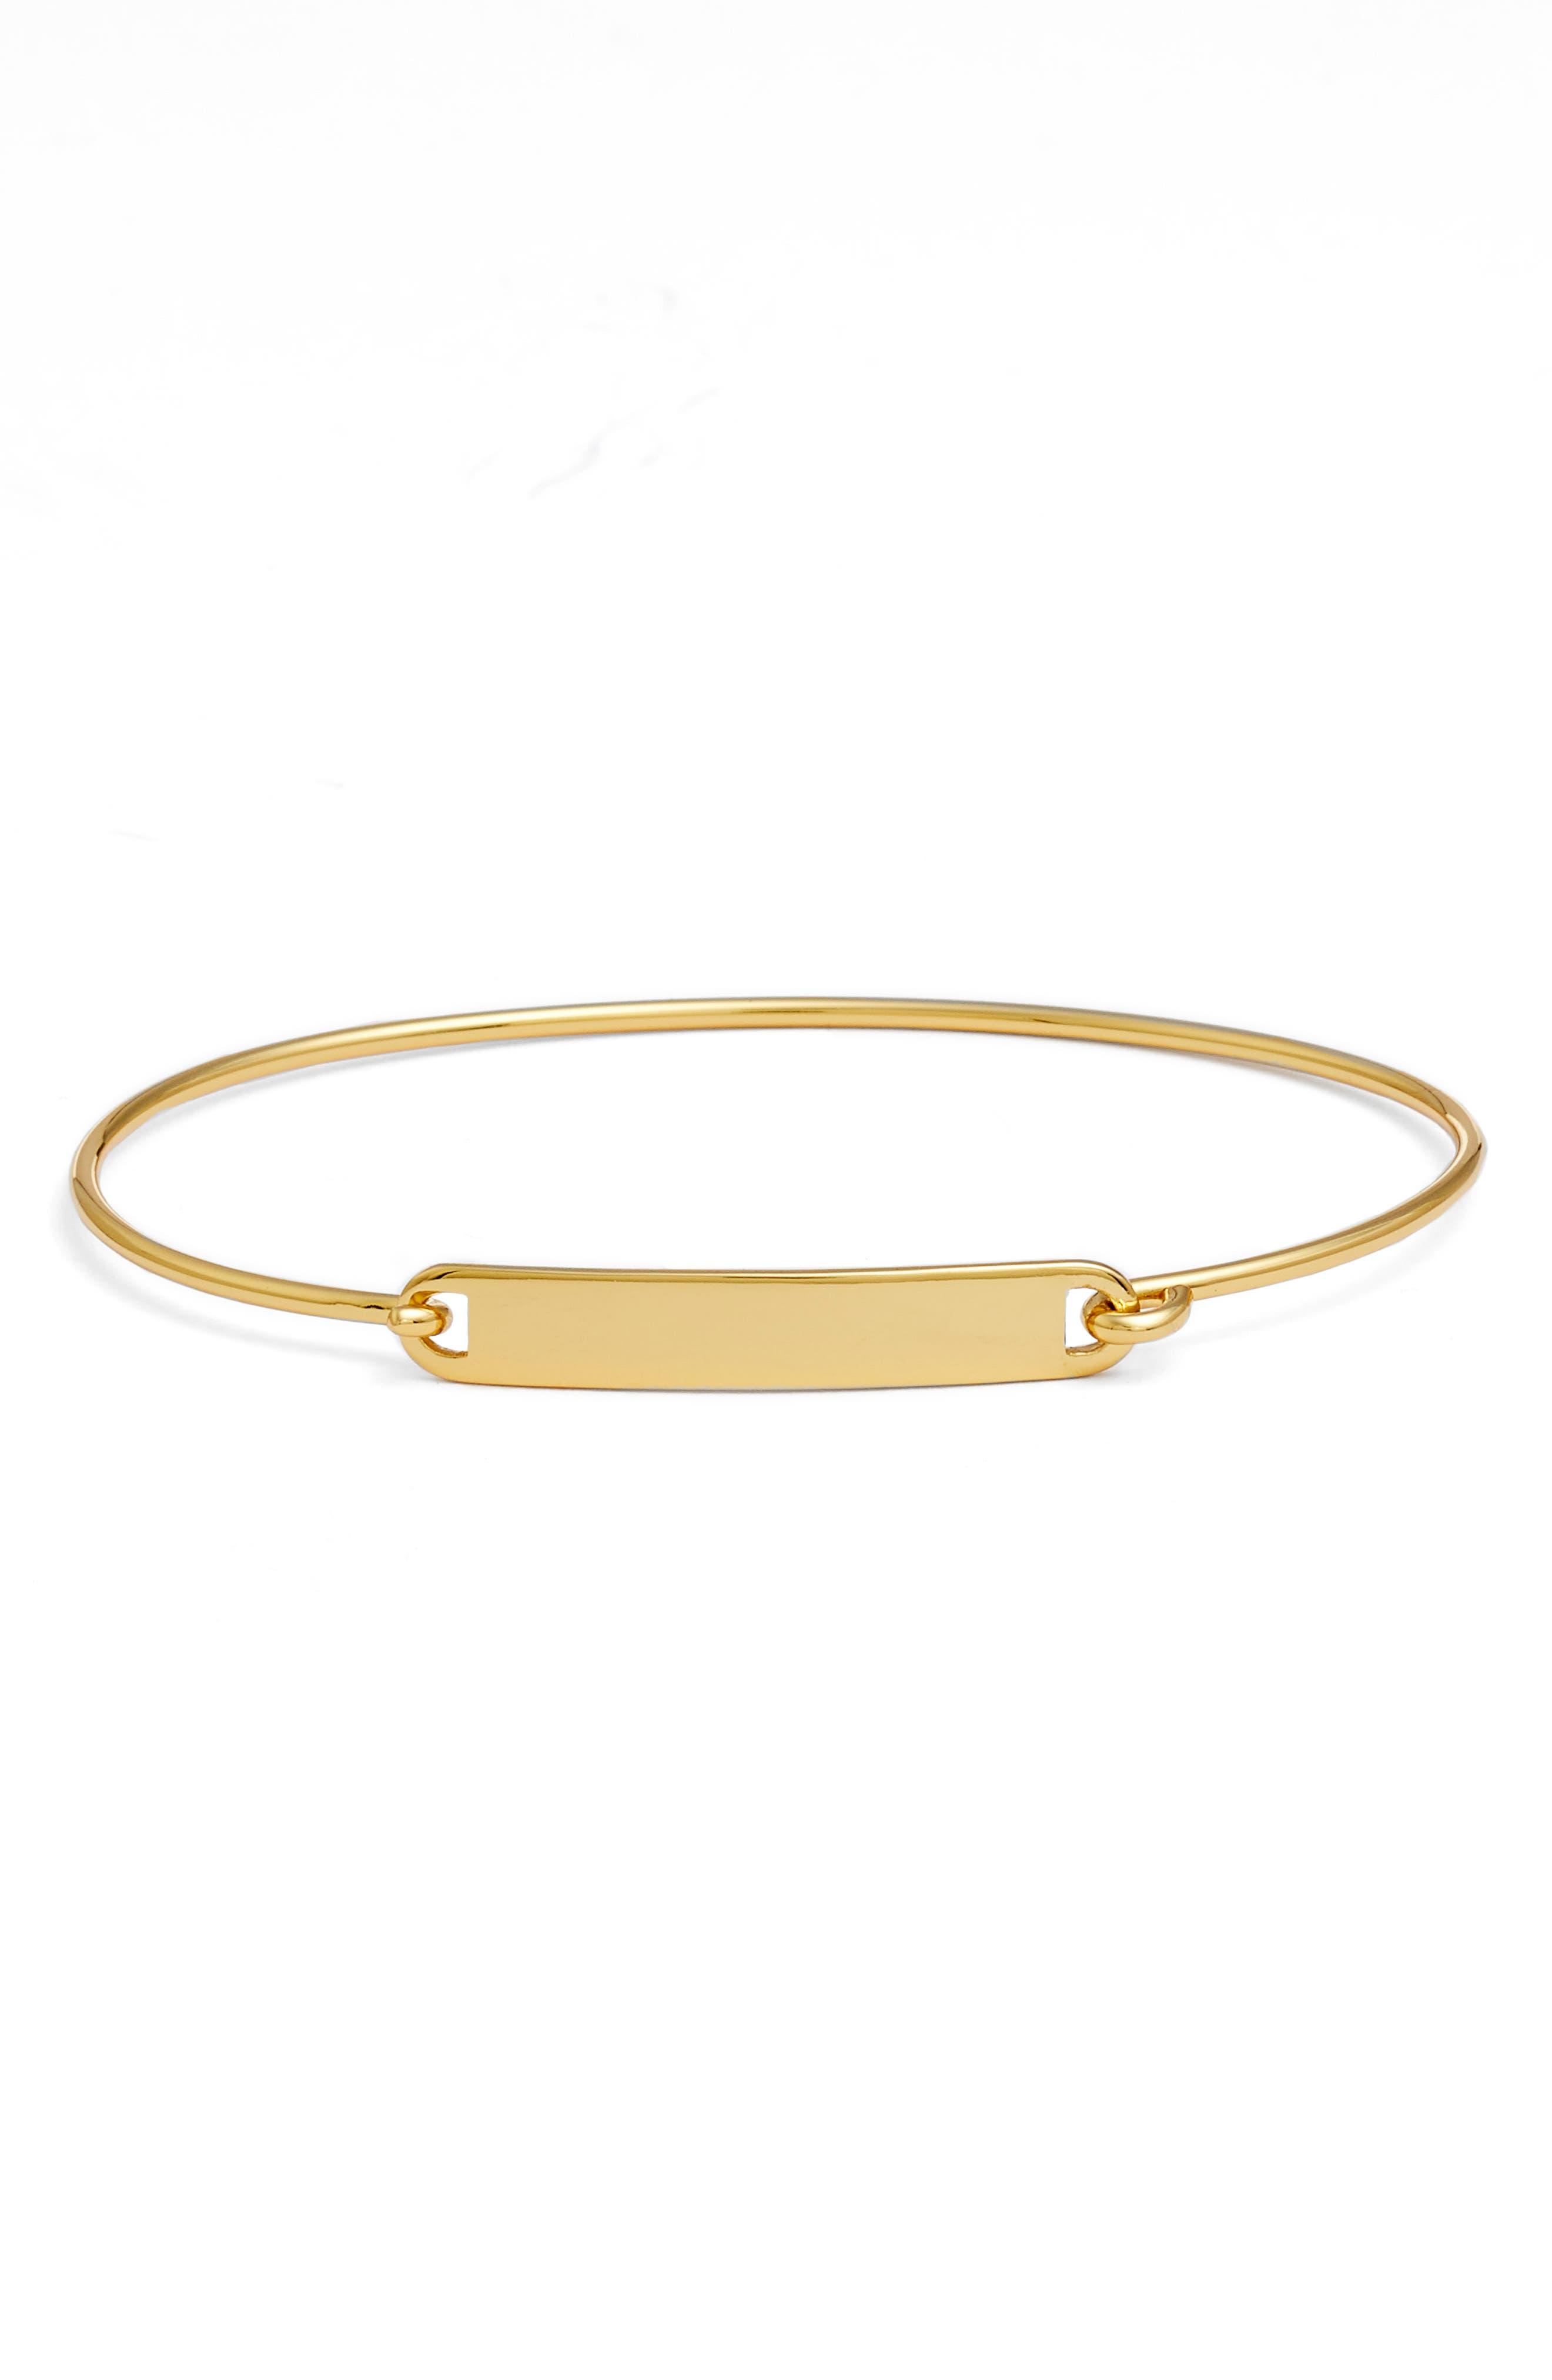 Argento Vivo ID Cuff Bracelet